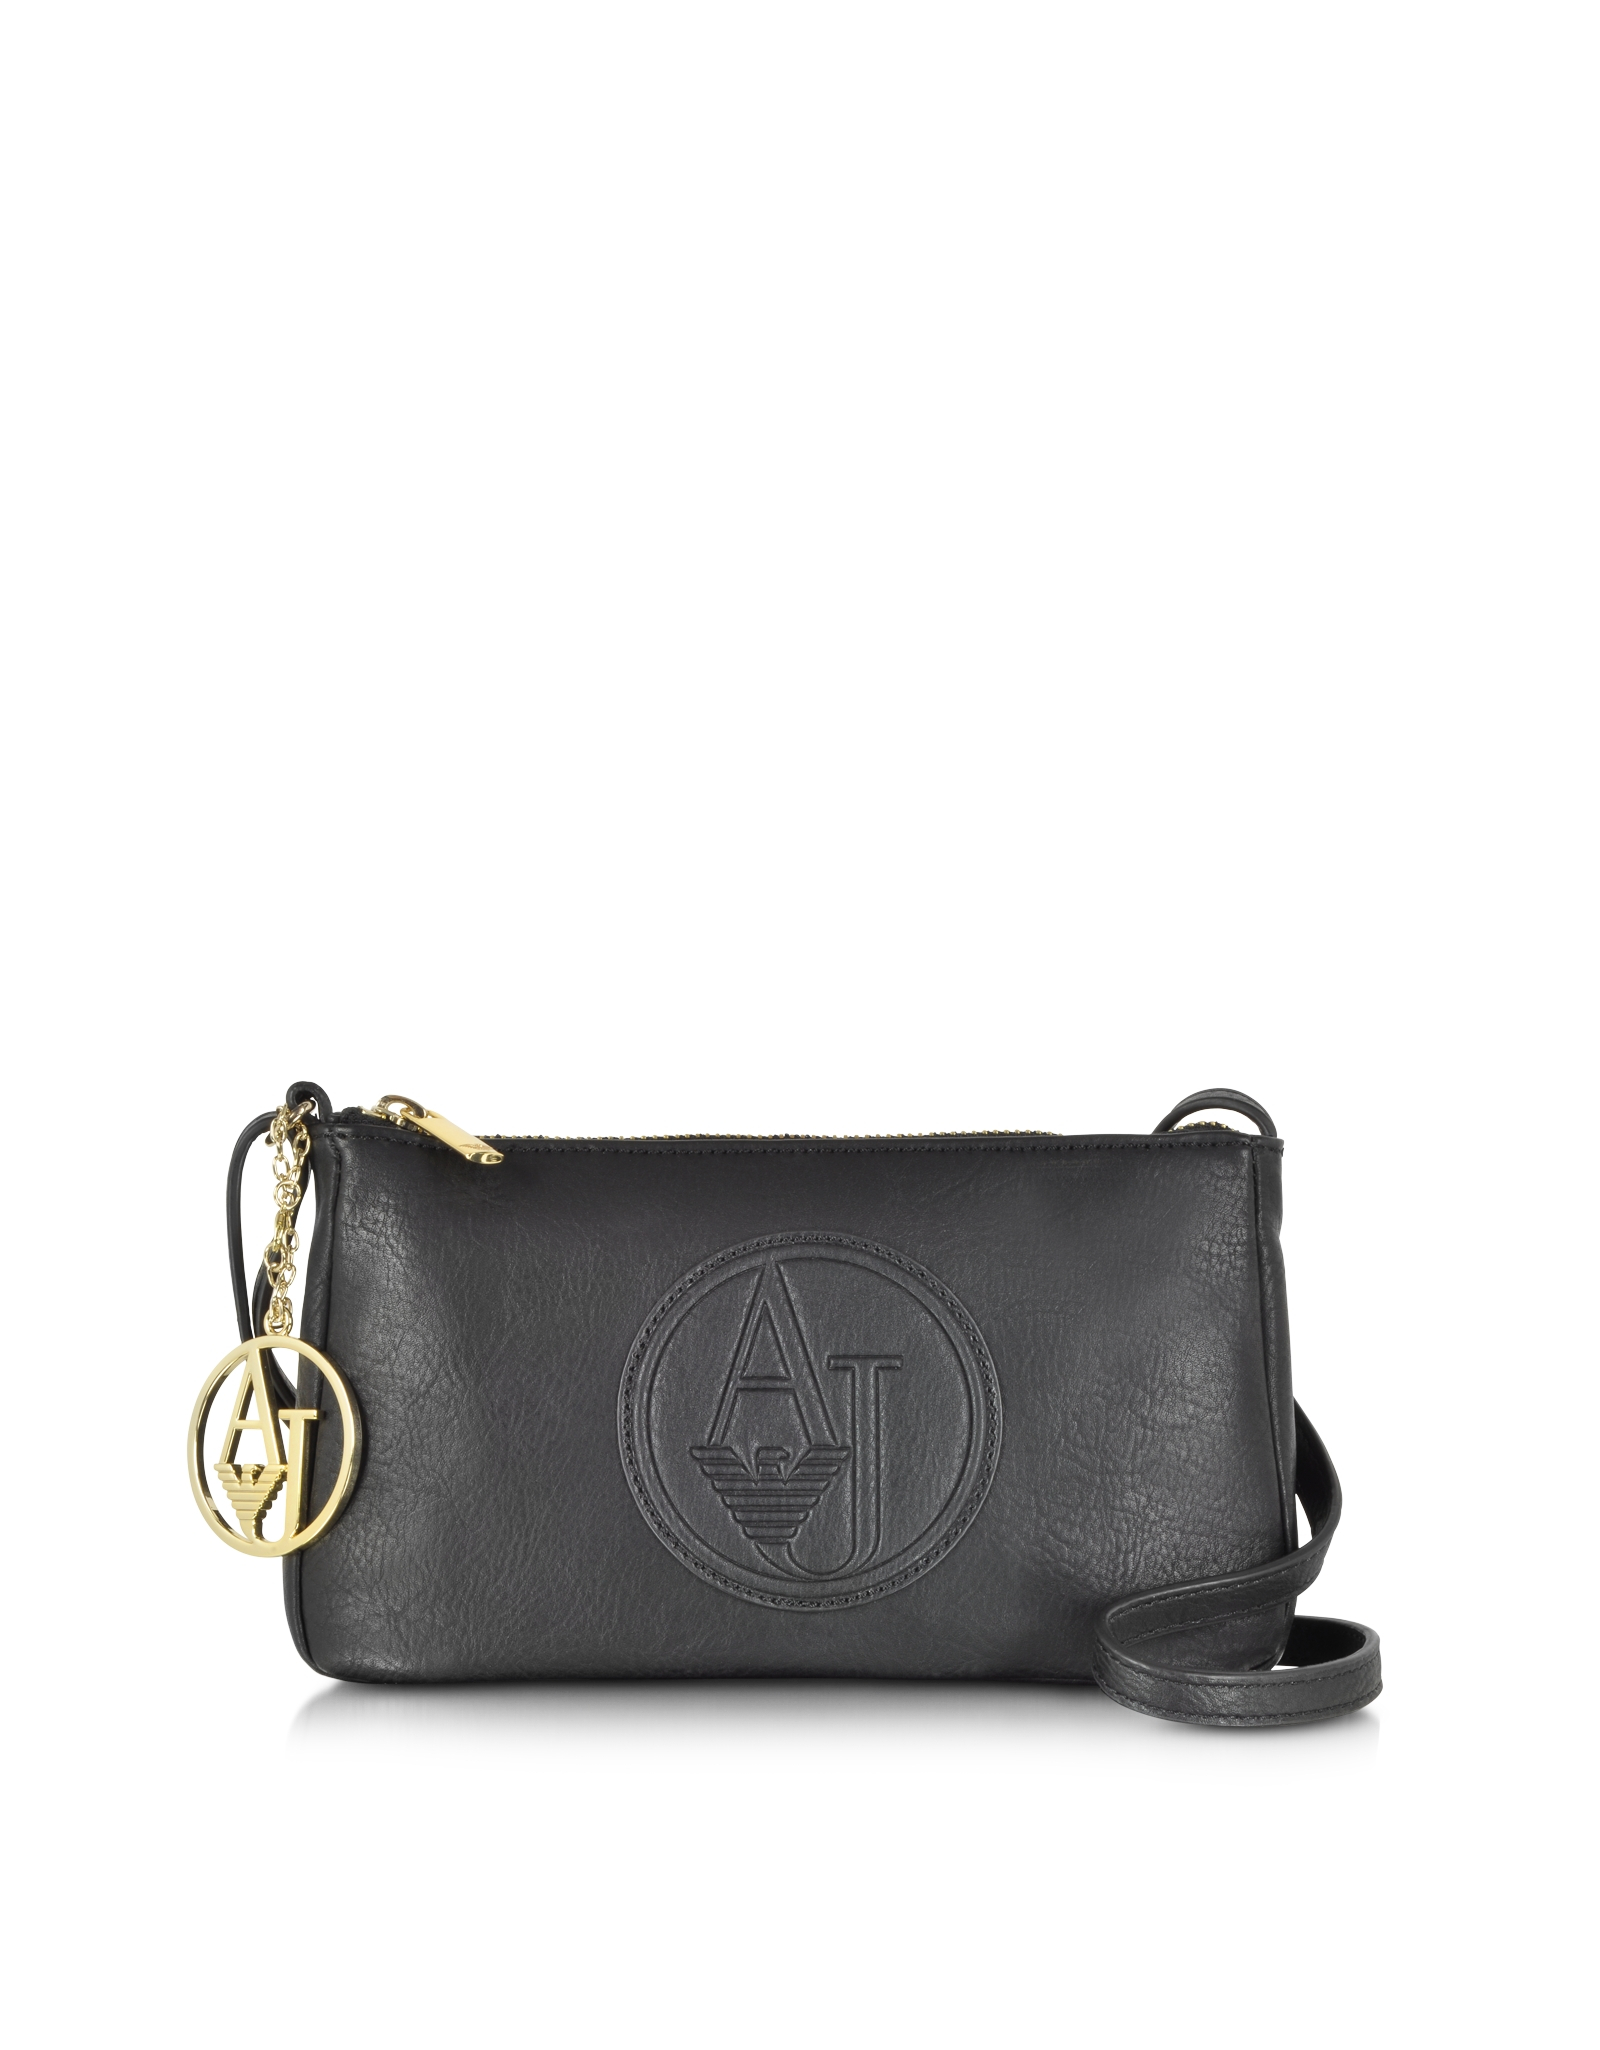 9061a0fa2f Armani Jeans Faux Leather Mini Crossbody Bag in Black - Lyst